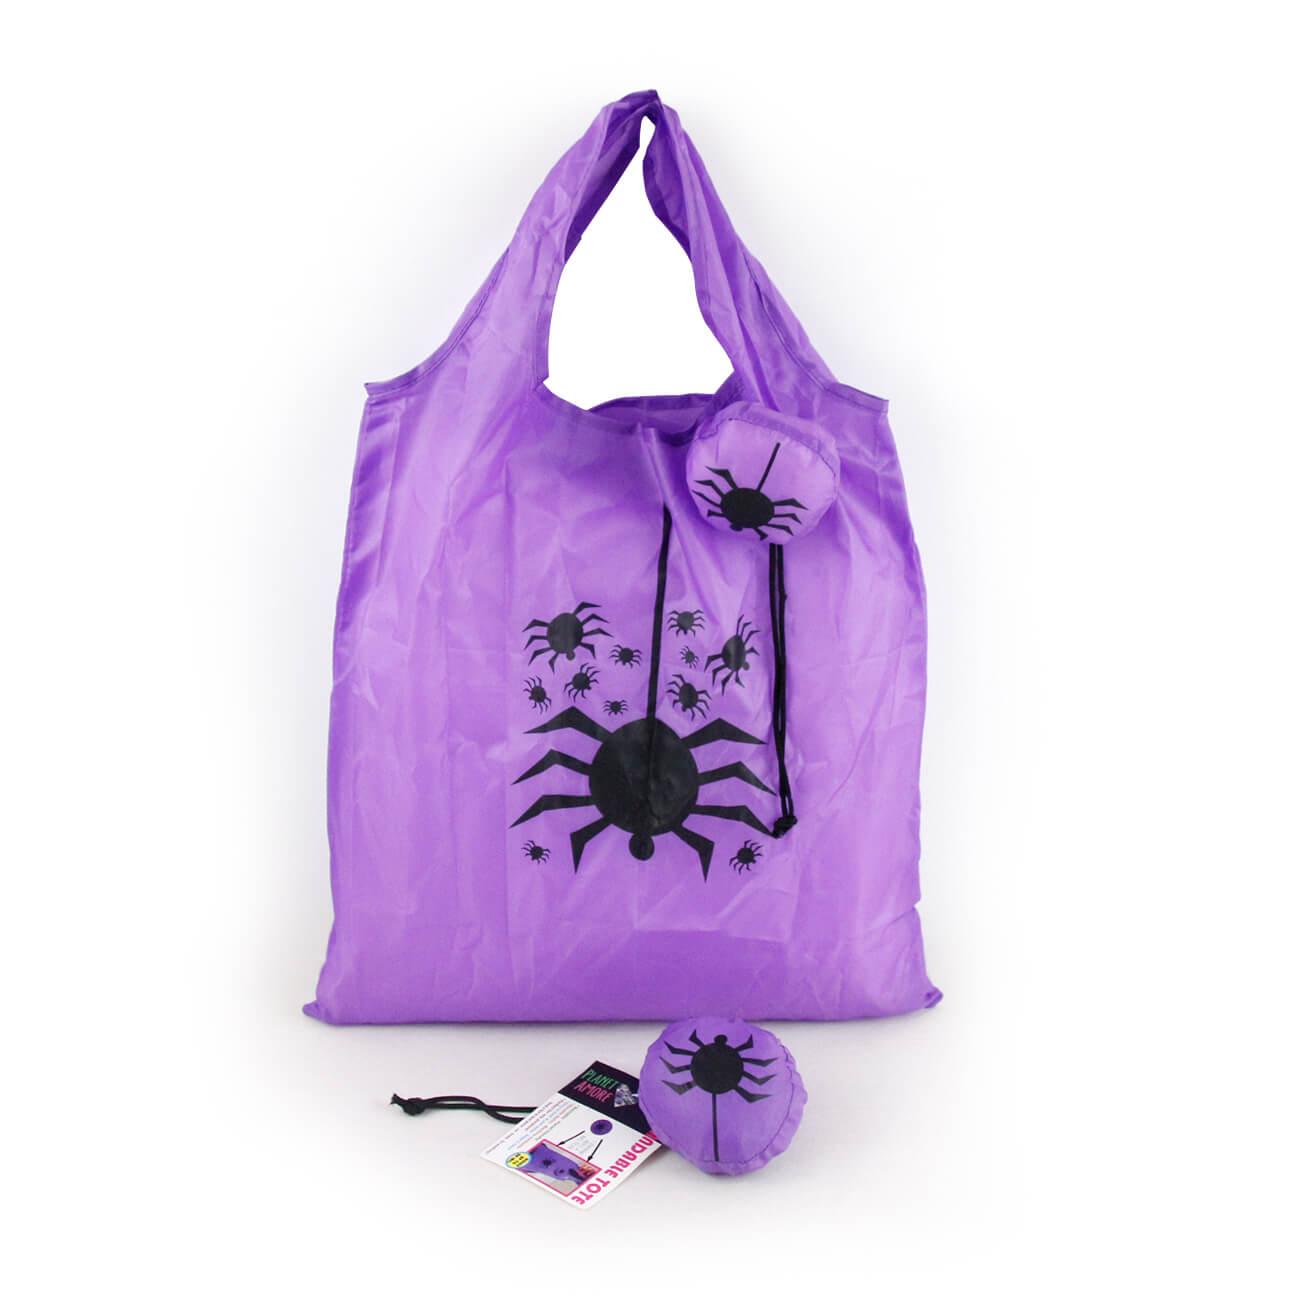 foldable halloween spider shopping bag reusable shopping bag nylon